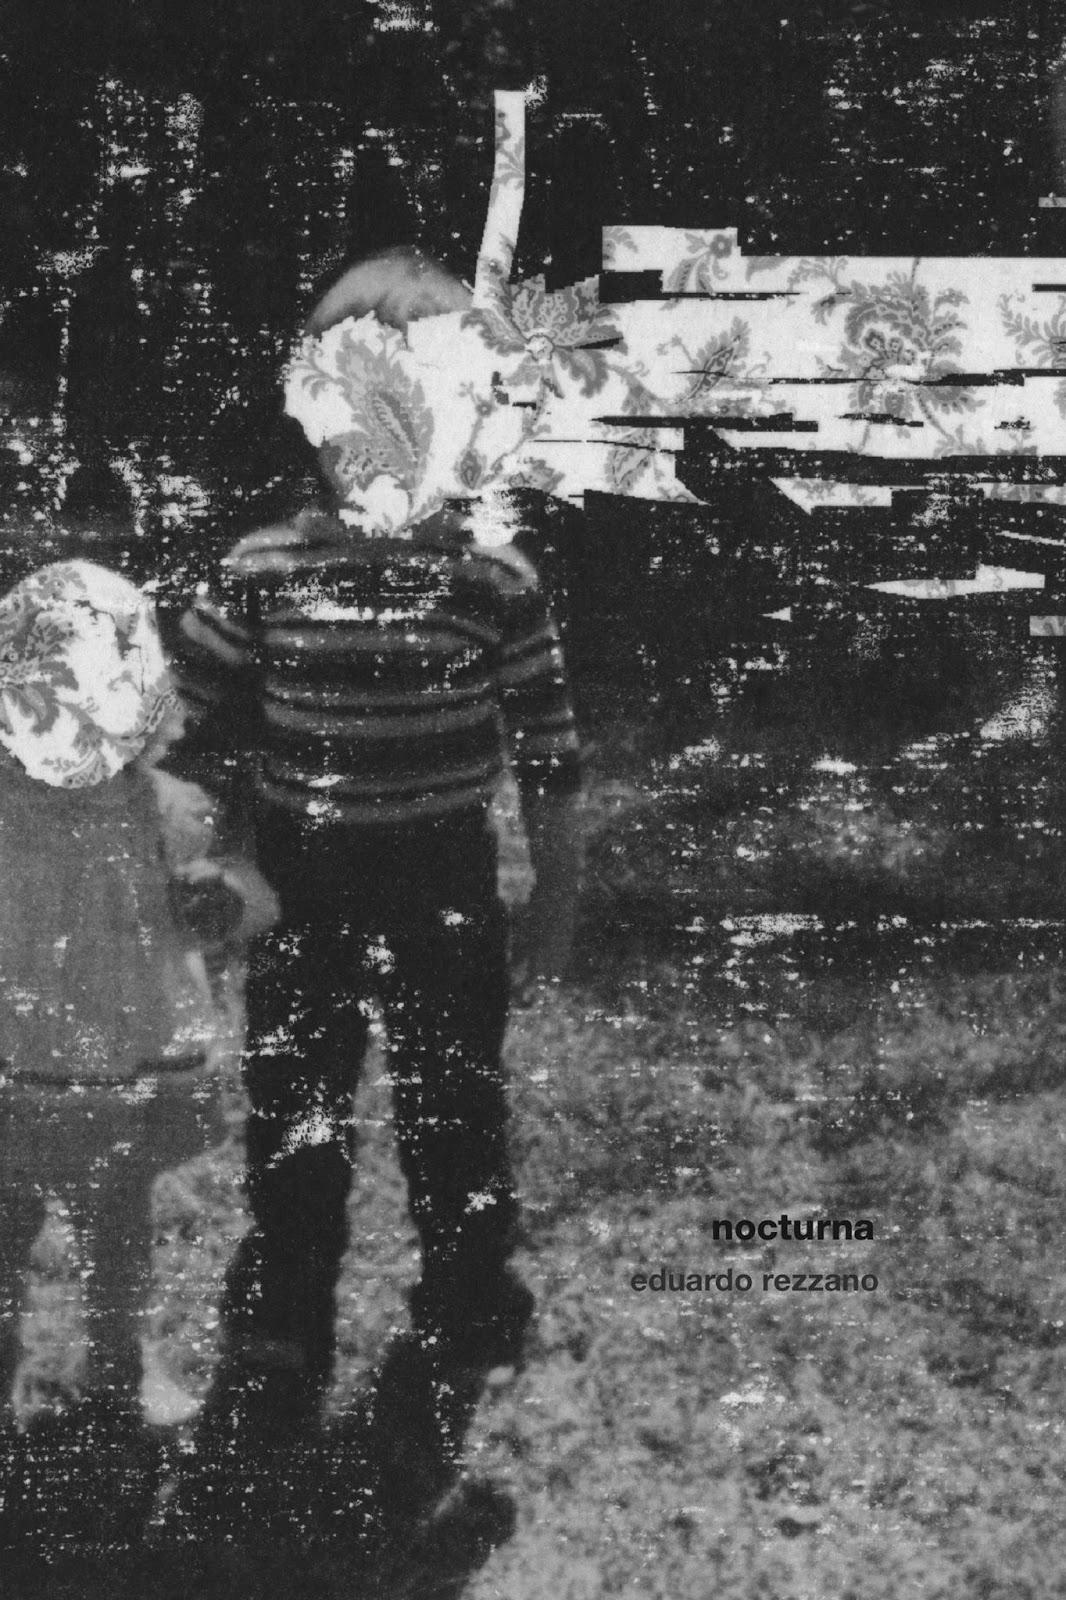 Eduardo Rezzano – Nocturna